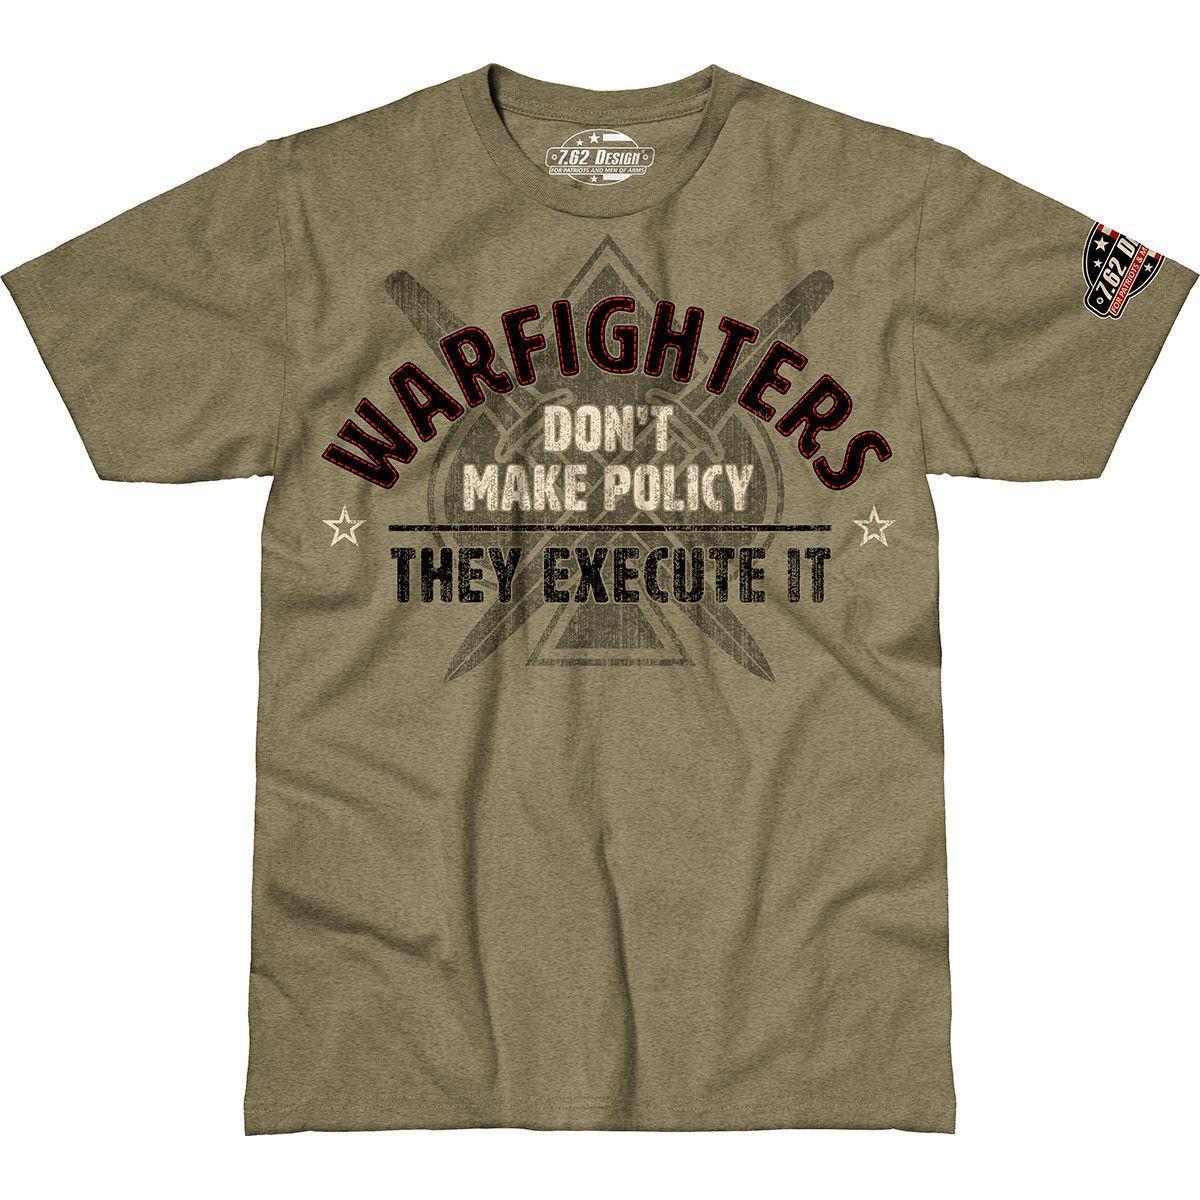 Футболка 7.62 Heather Warfighters L Хаки 762-001-581KH-L, КОД: 274005